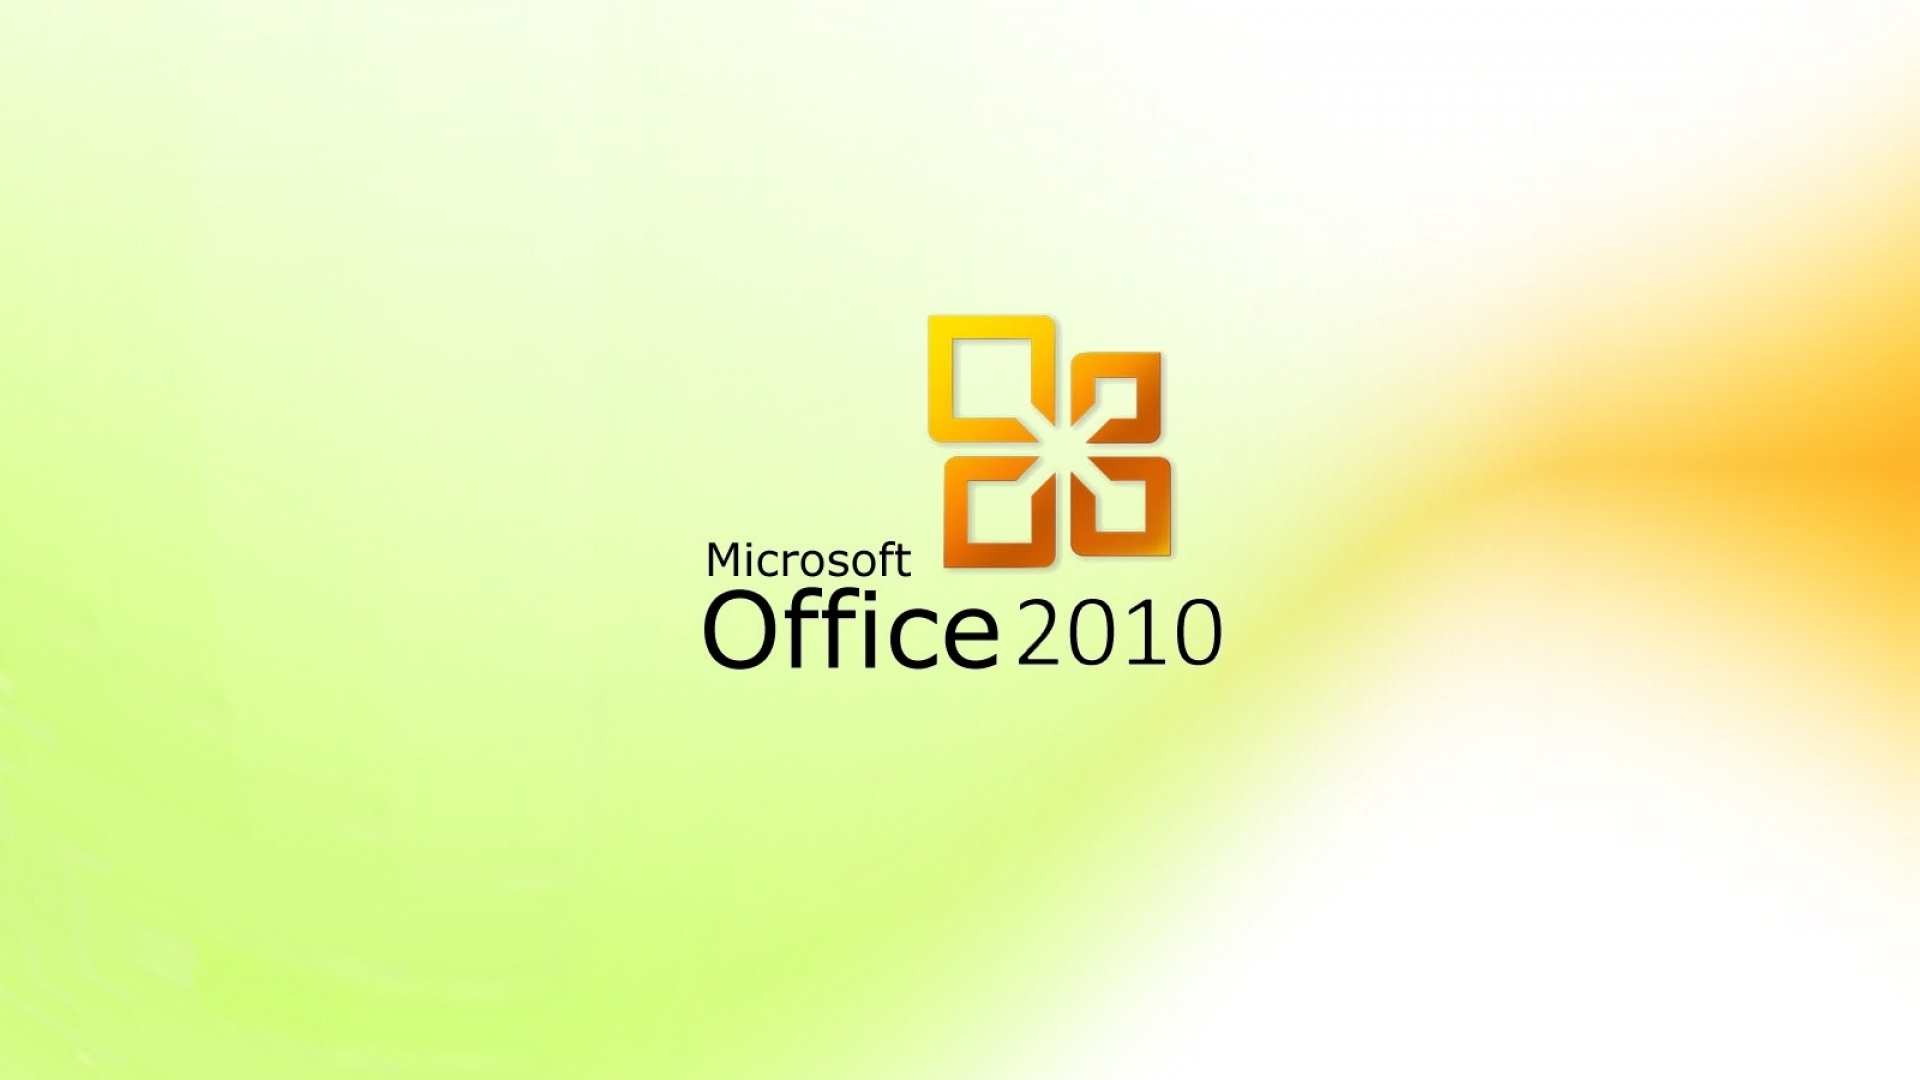 Microsoft Office Wallpaper | Microsoft Office | Pinterest ...